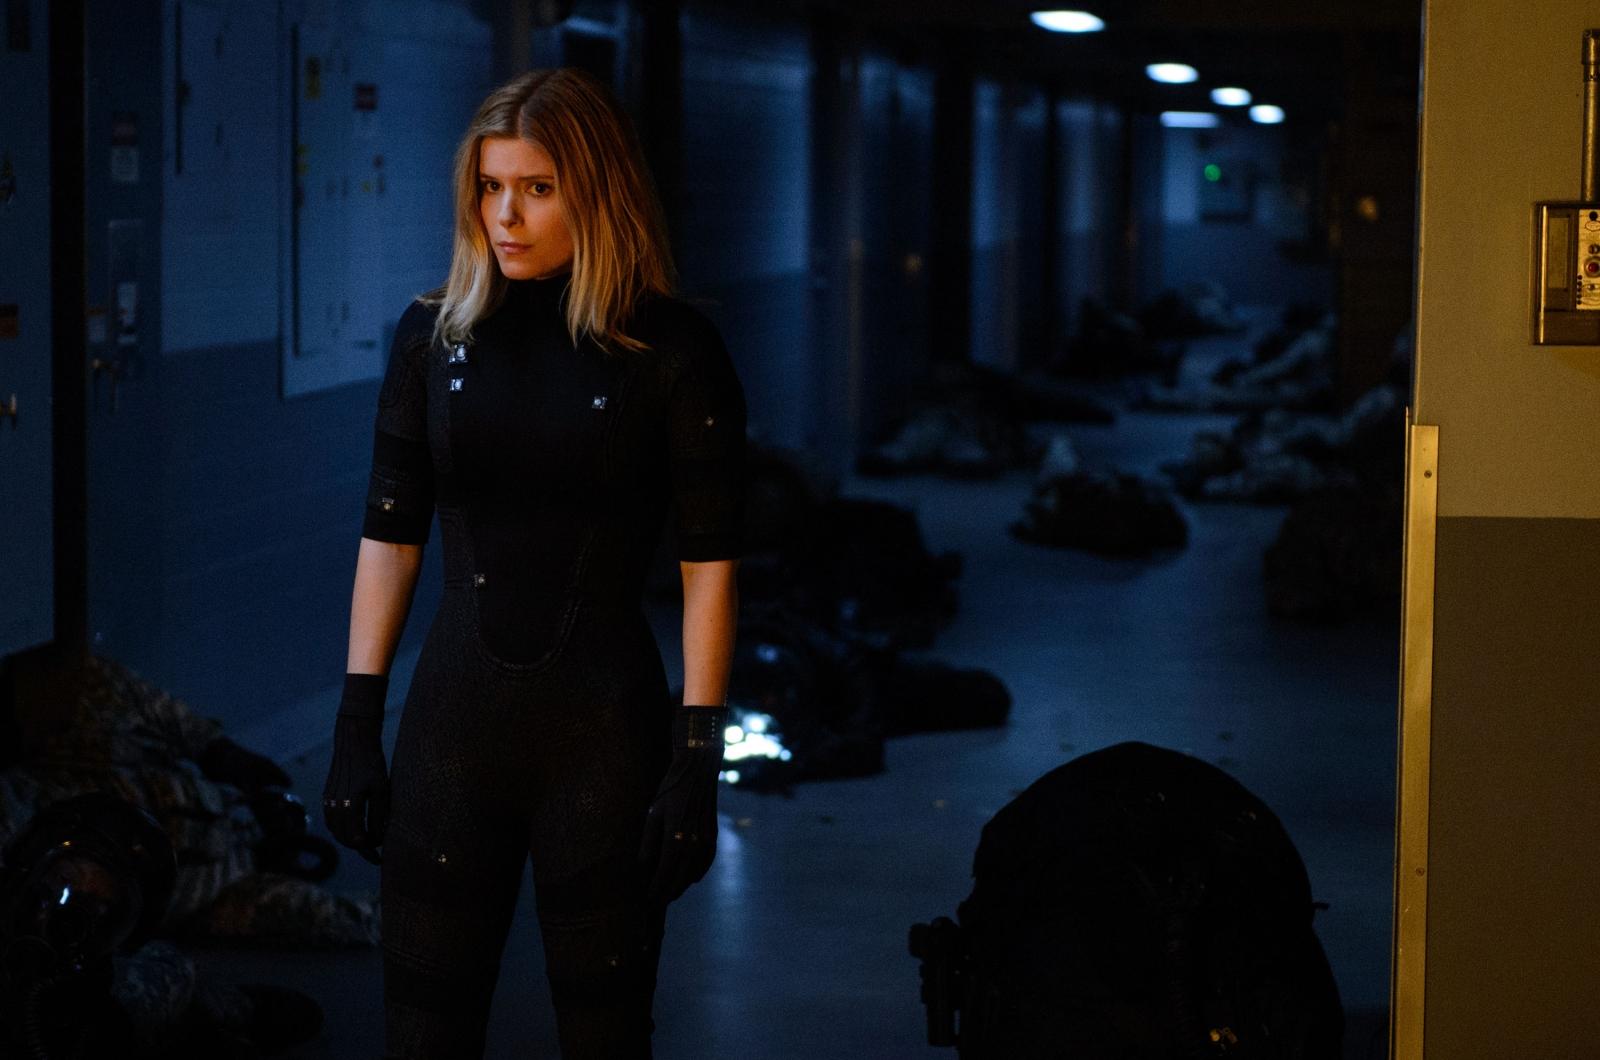 Kate Mara Sue Storm in Fantastic Four